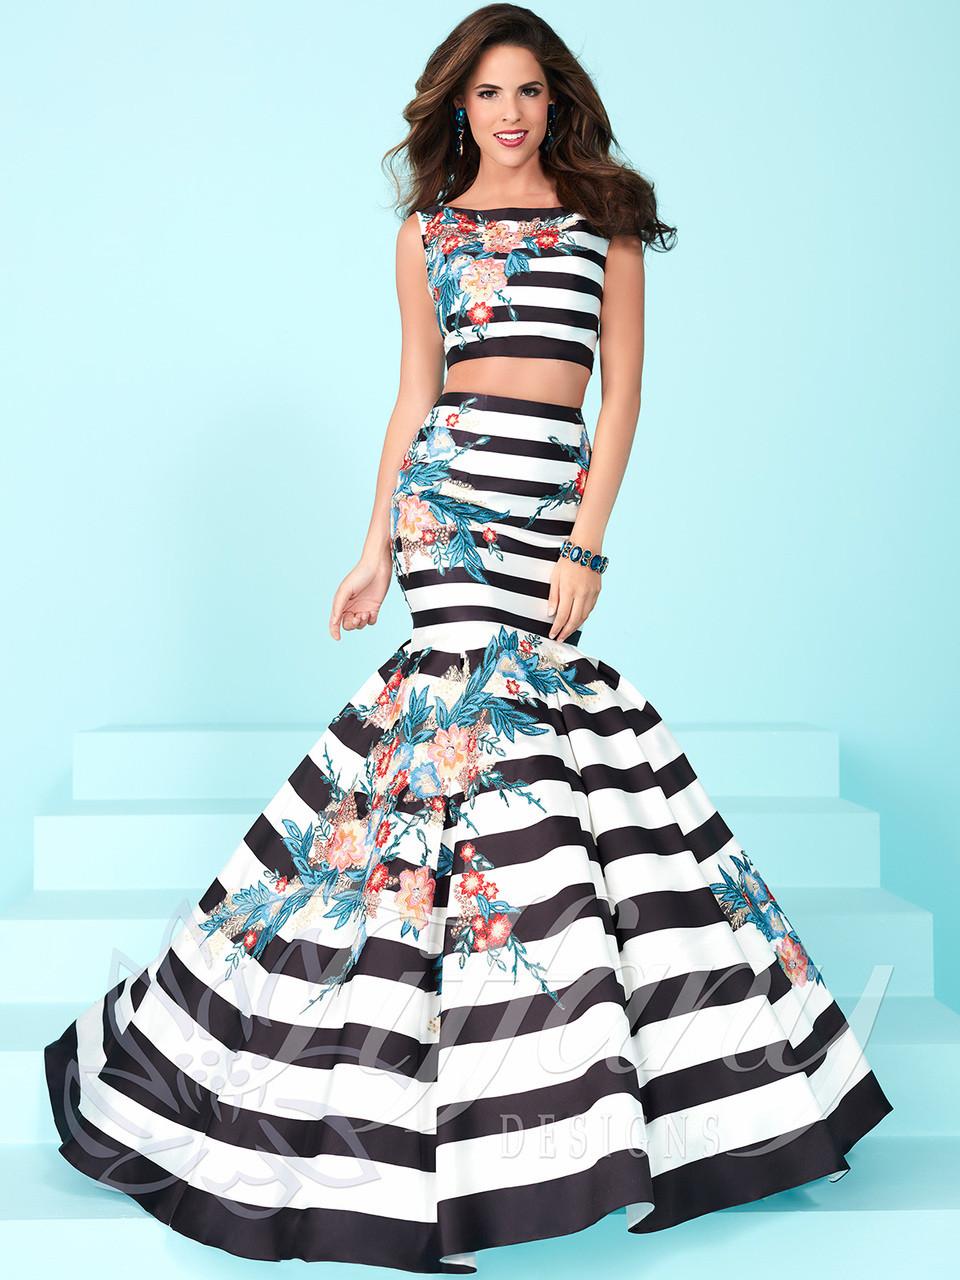 Tiffany Designs 16250 Printed Striped Prom Dress | PromHeadquarters.com